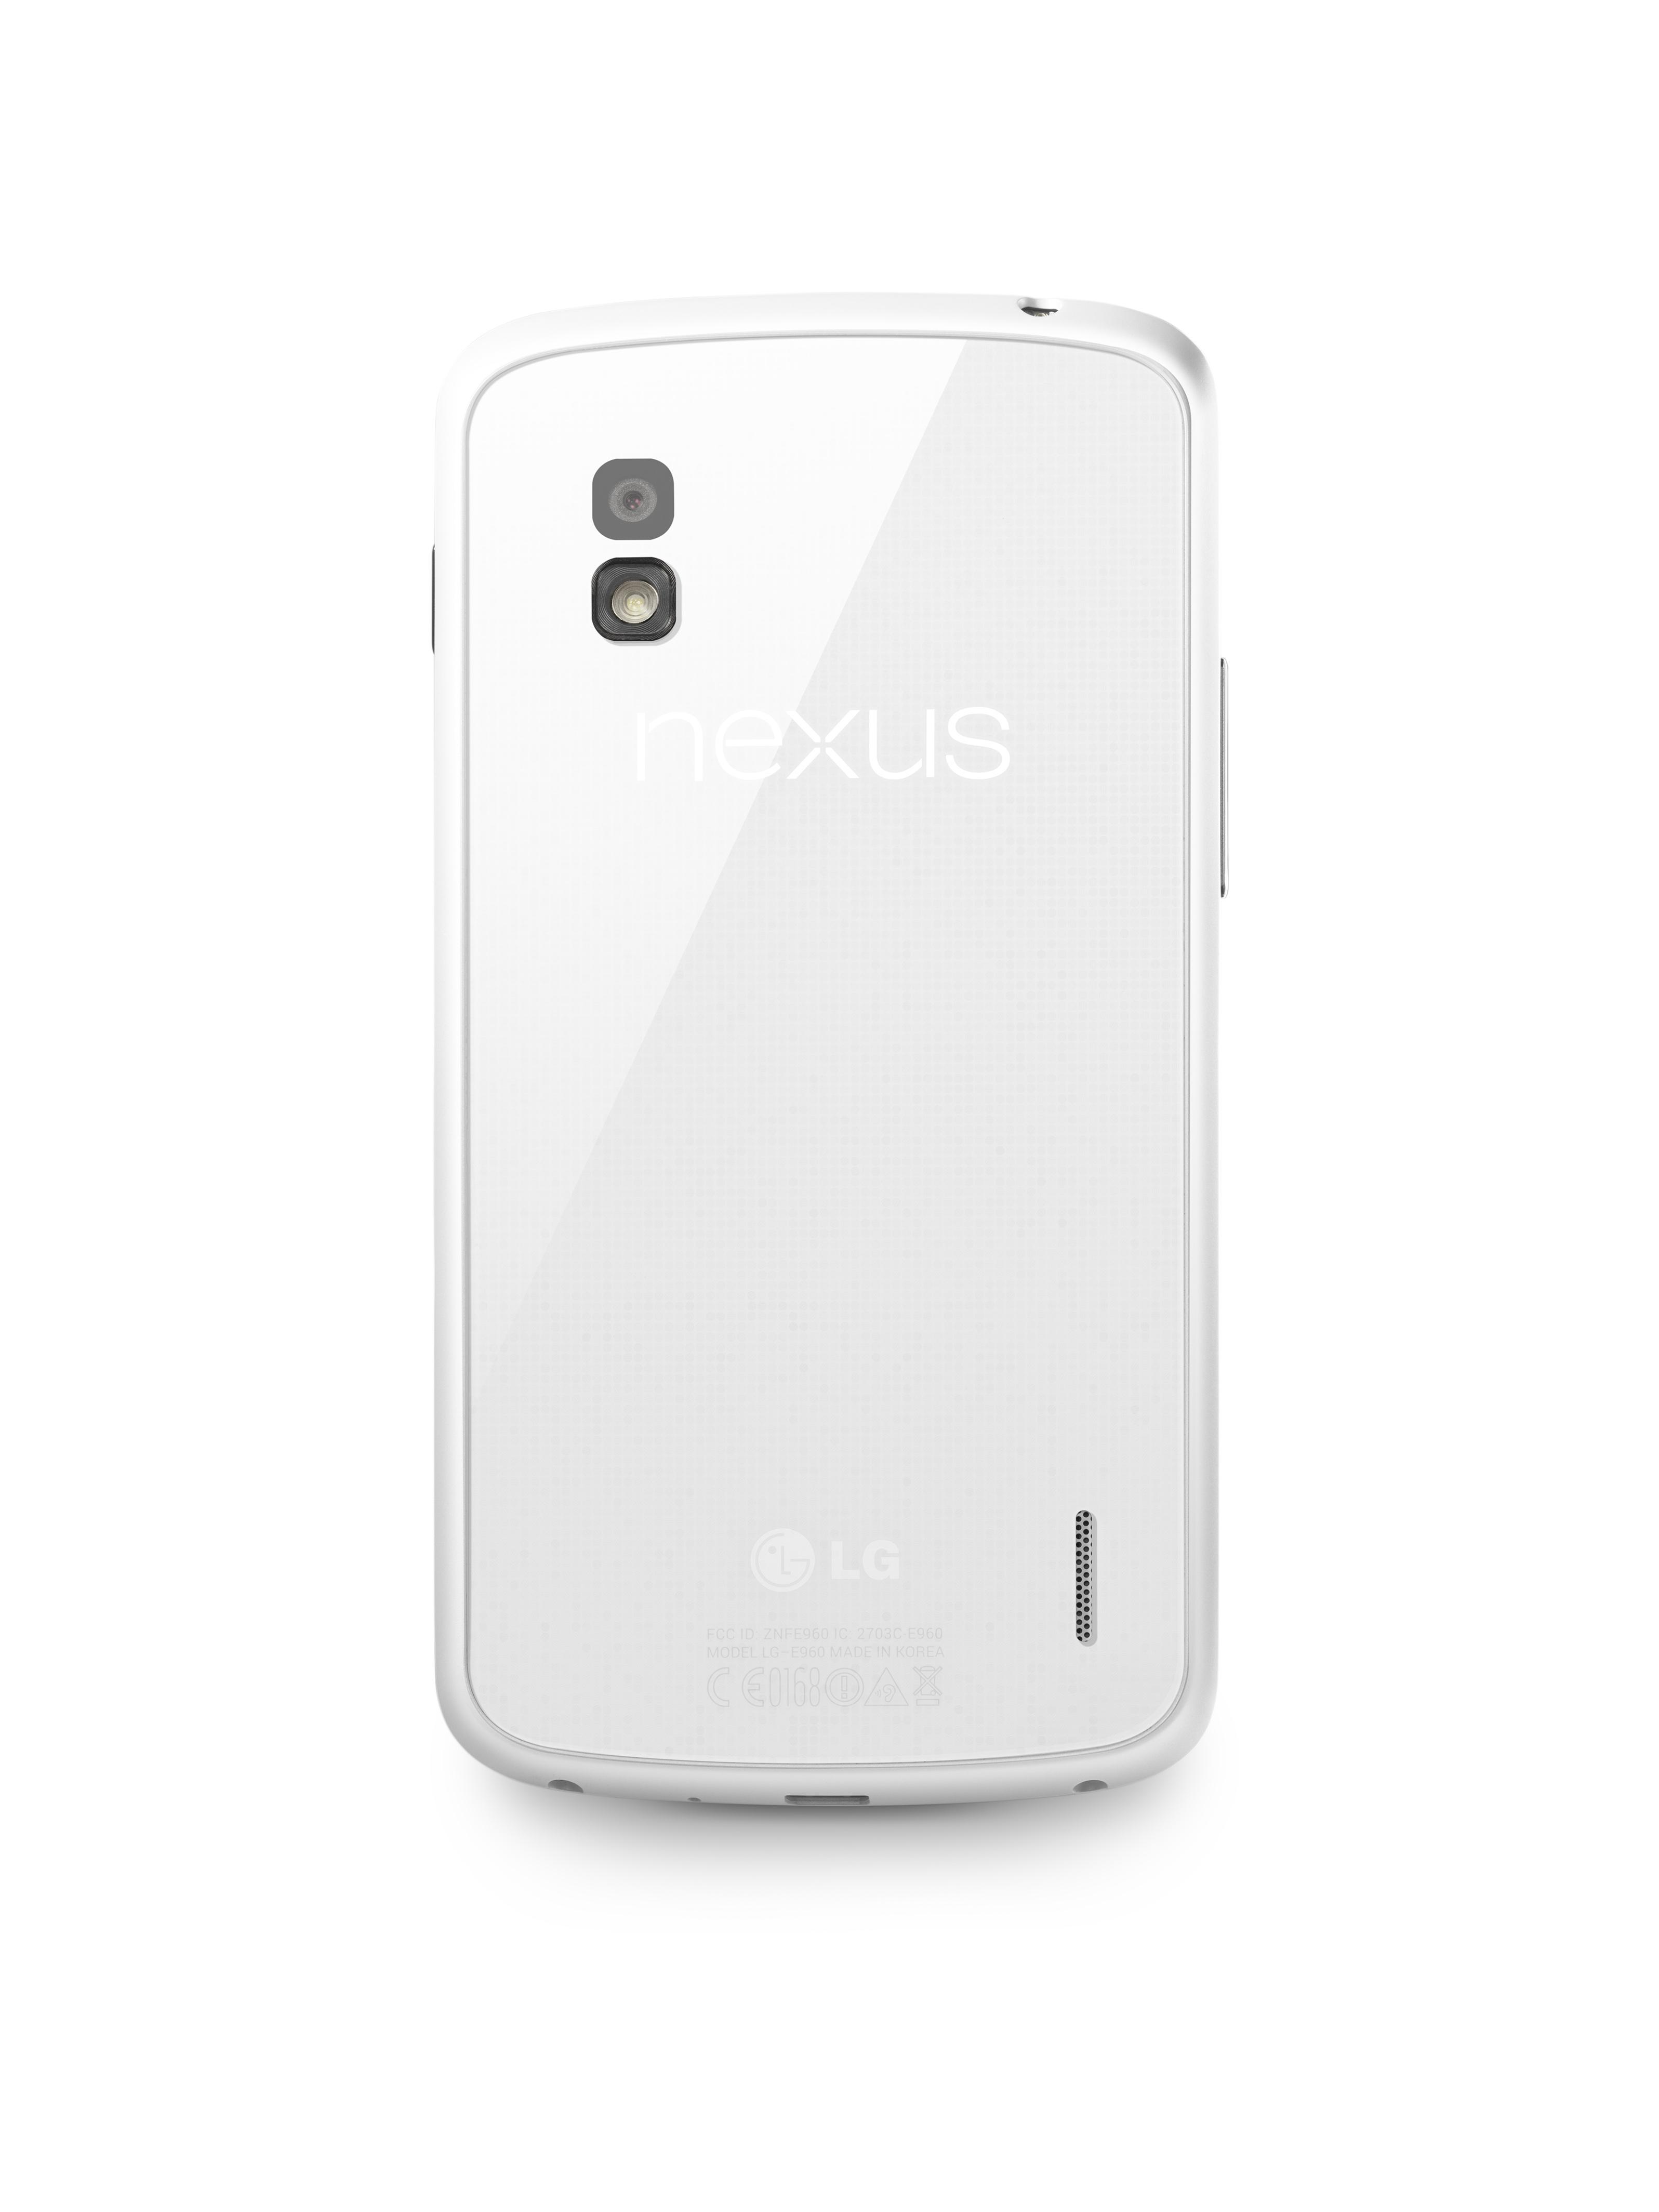 A rear view of the Nexus 4 White